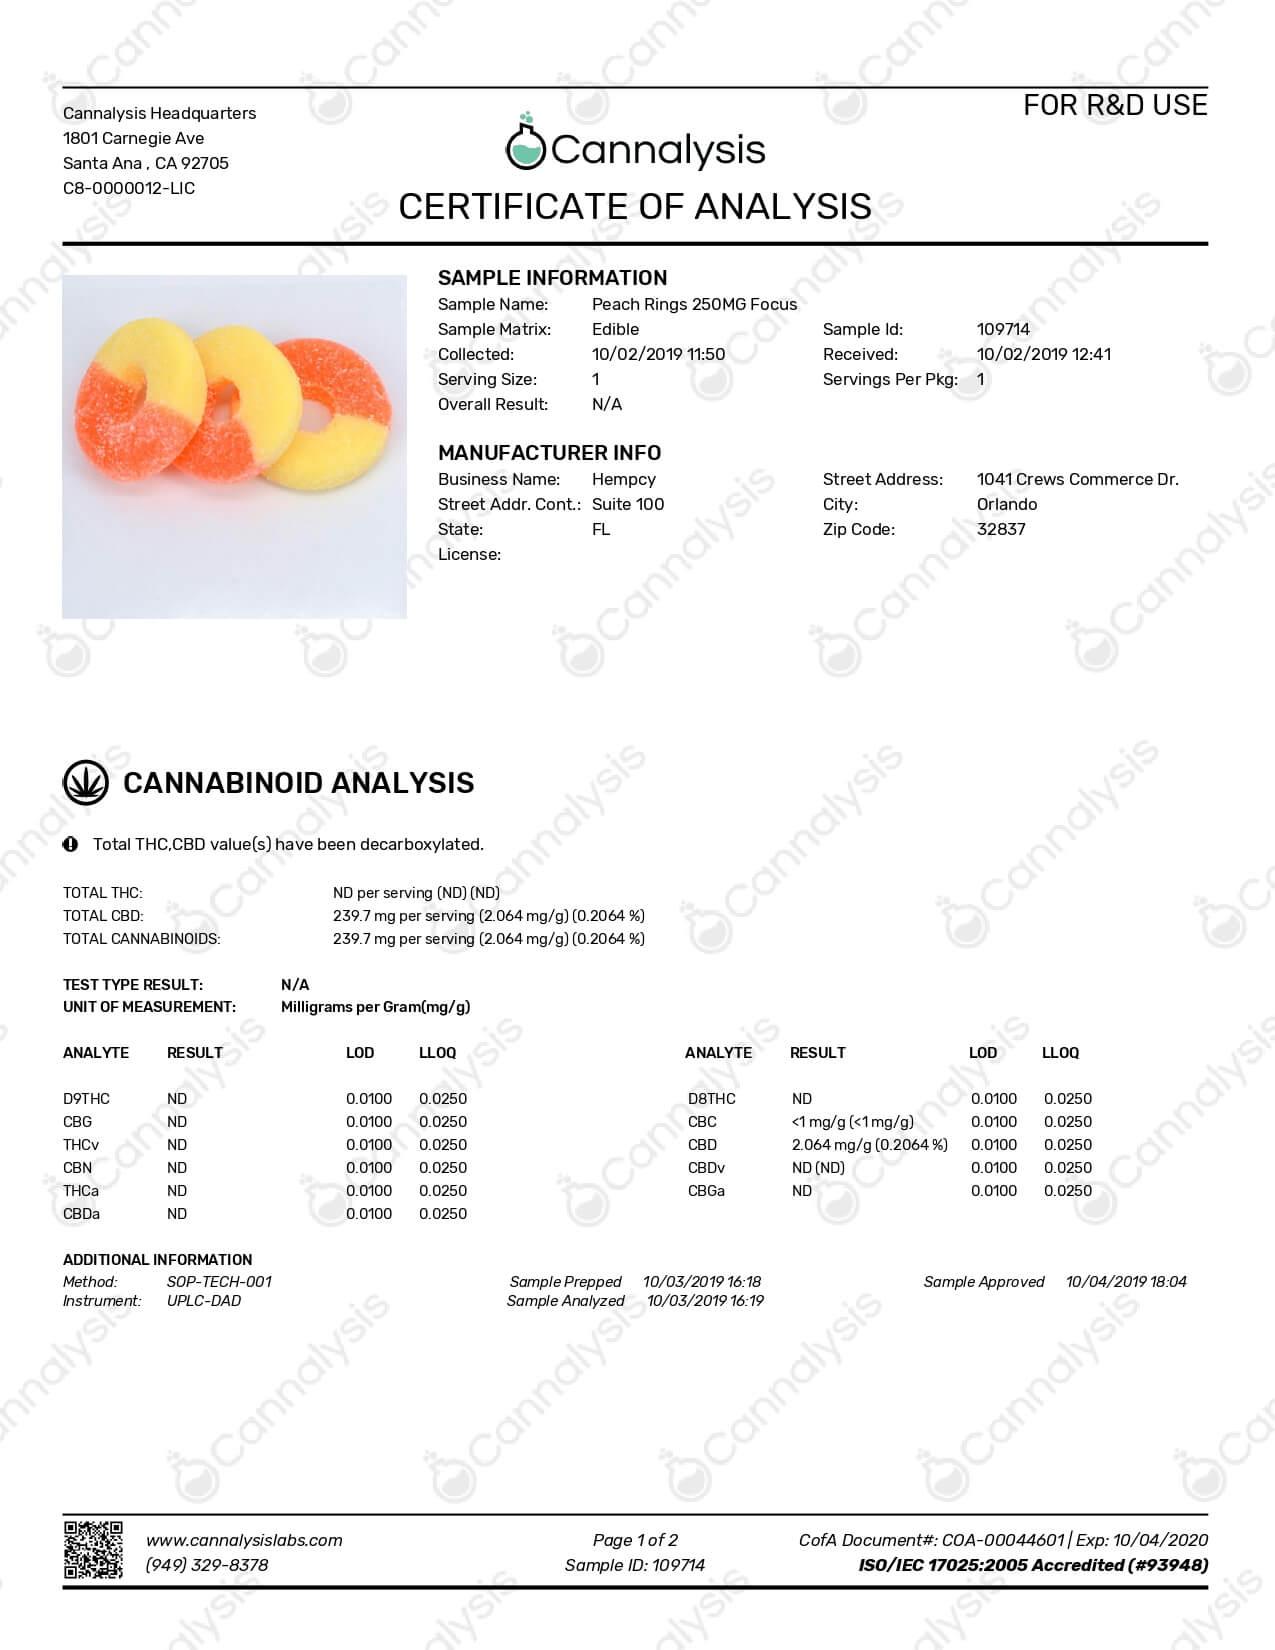 Hempcy CBD Edible Peach Ring Gummies Lab Report